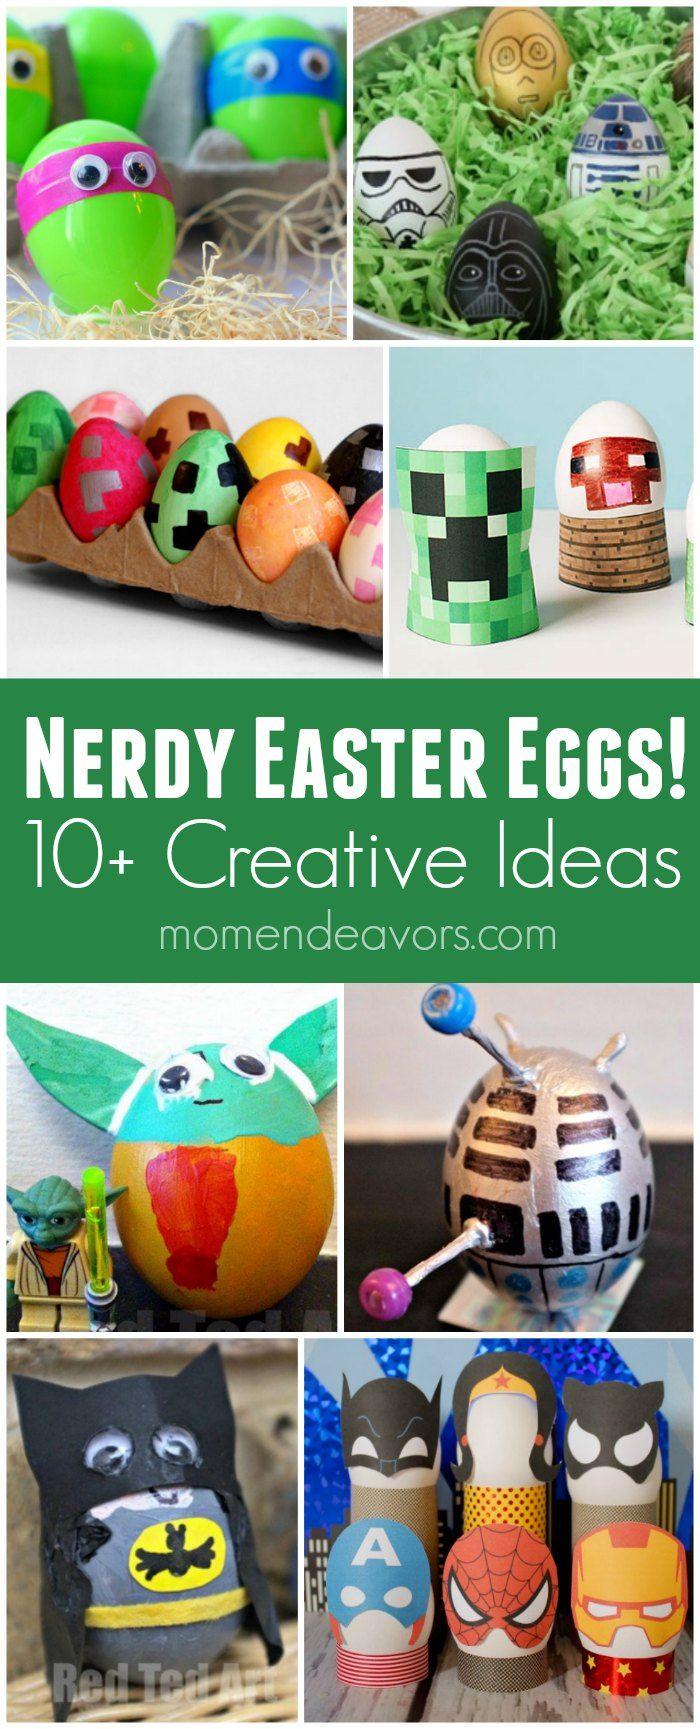 10 Nerdy Easter Egg Ideas Contest Giveaway Easter Eggs Easter Egg Designs Easter Kids